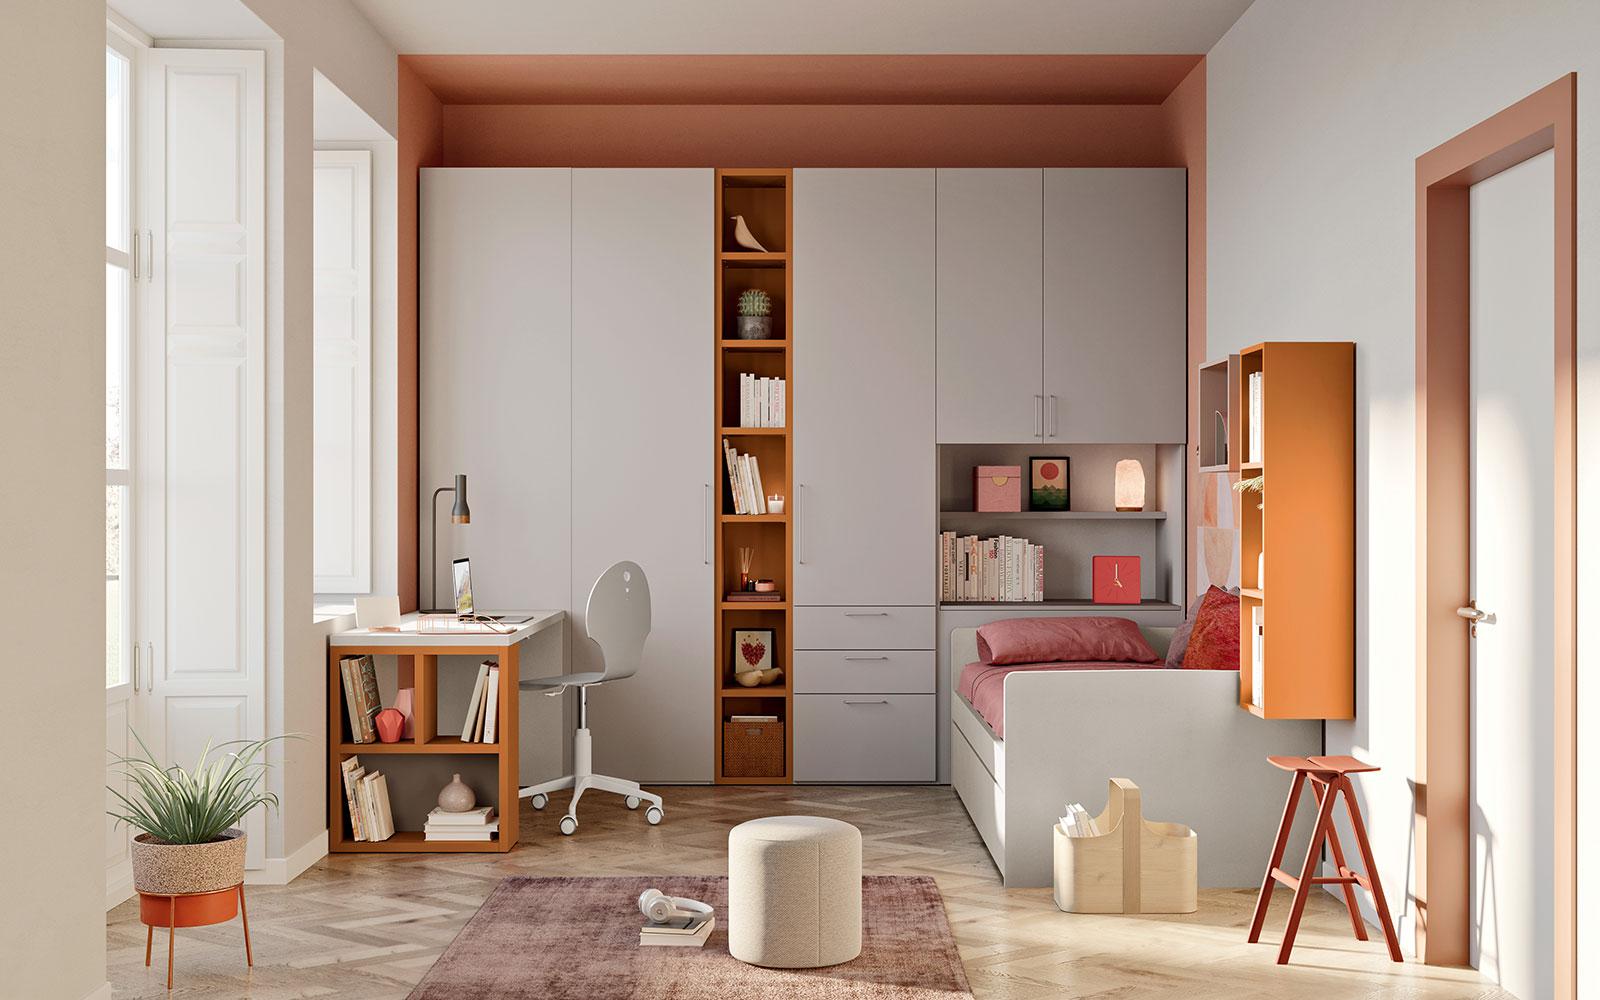 camerette-mobili-ricci04